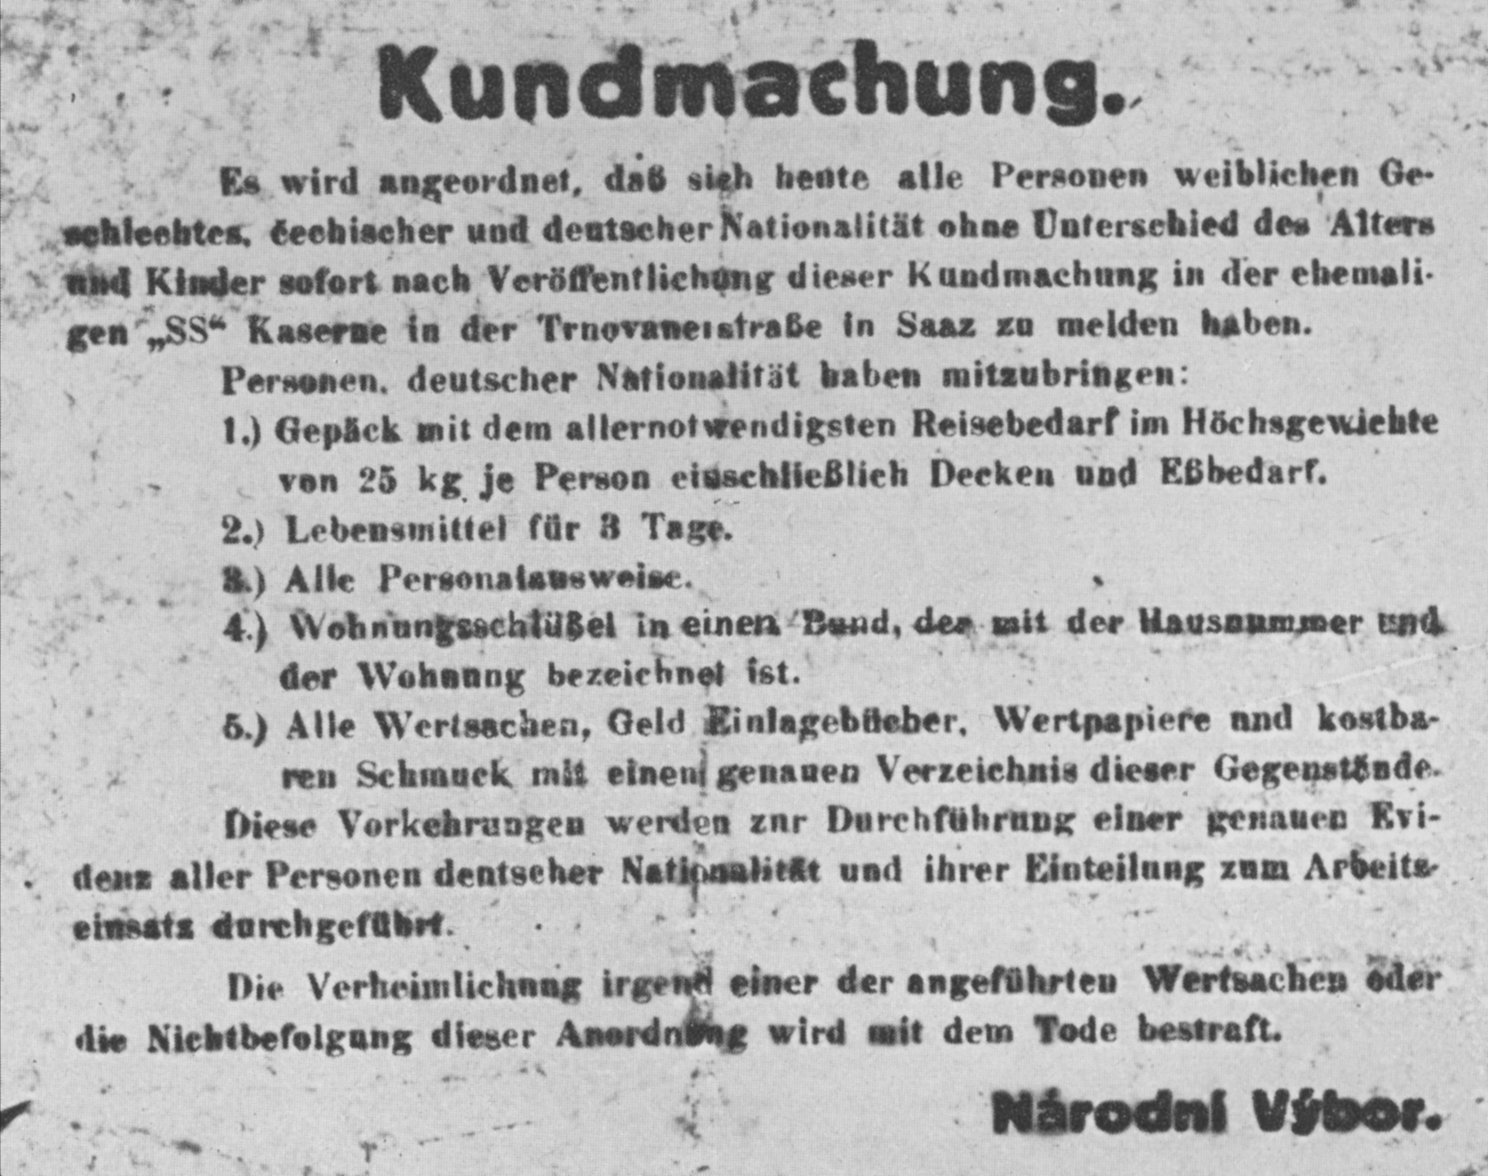 https://i2.wp.com/de.metapedia.org/m/images/6/62/Dokumente_zur_Austreibung_der_Sudetendeutschen_-_Kundmachung.jpg